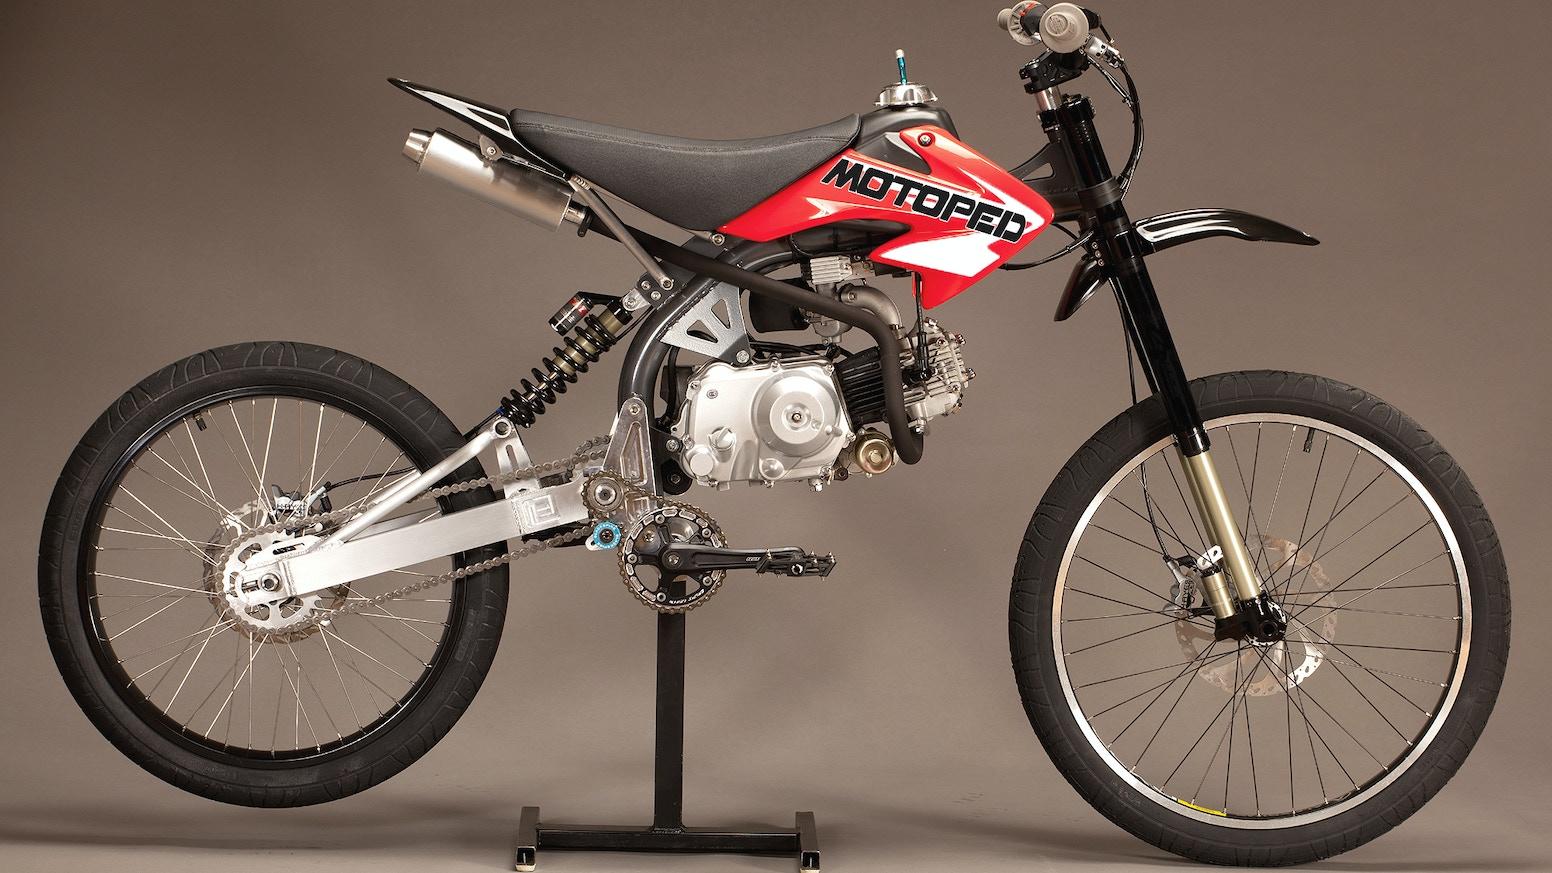 Motopeds by Moto Fusion — Kickstarter